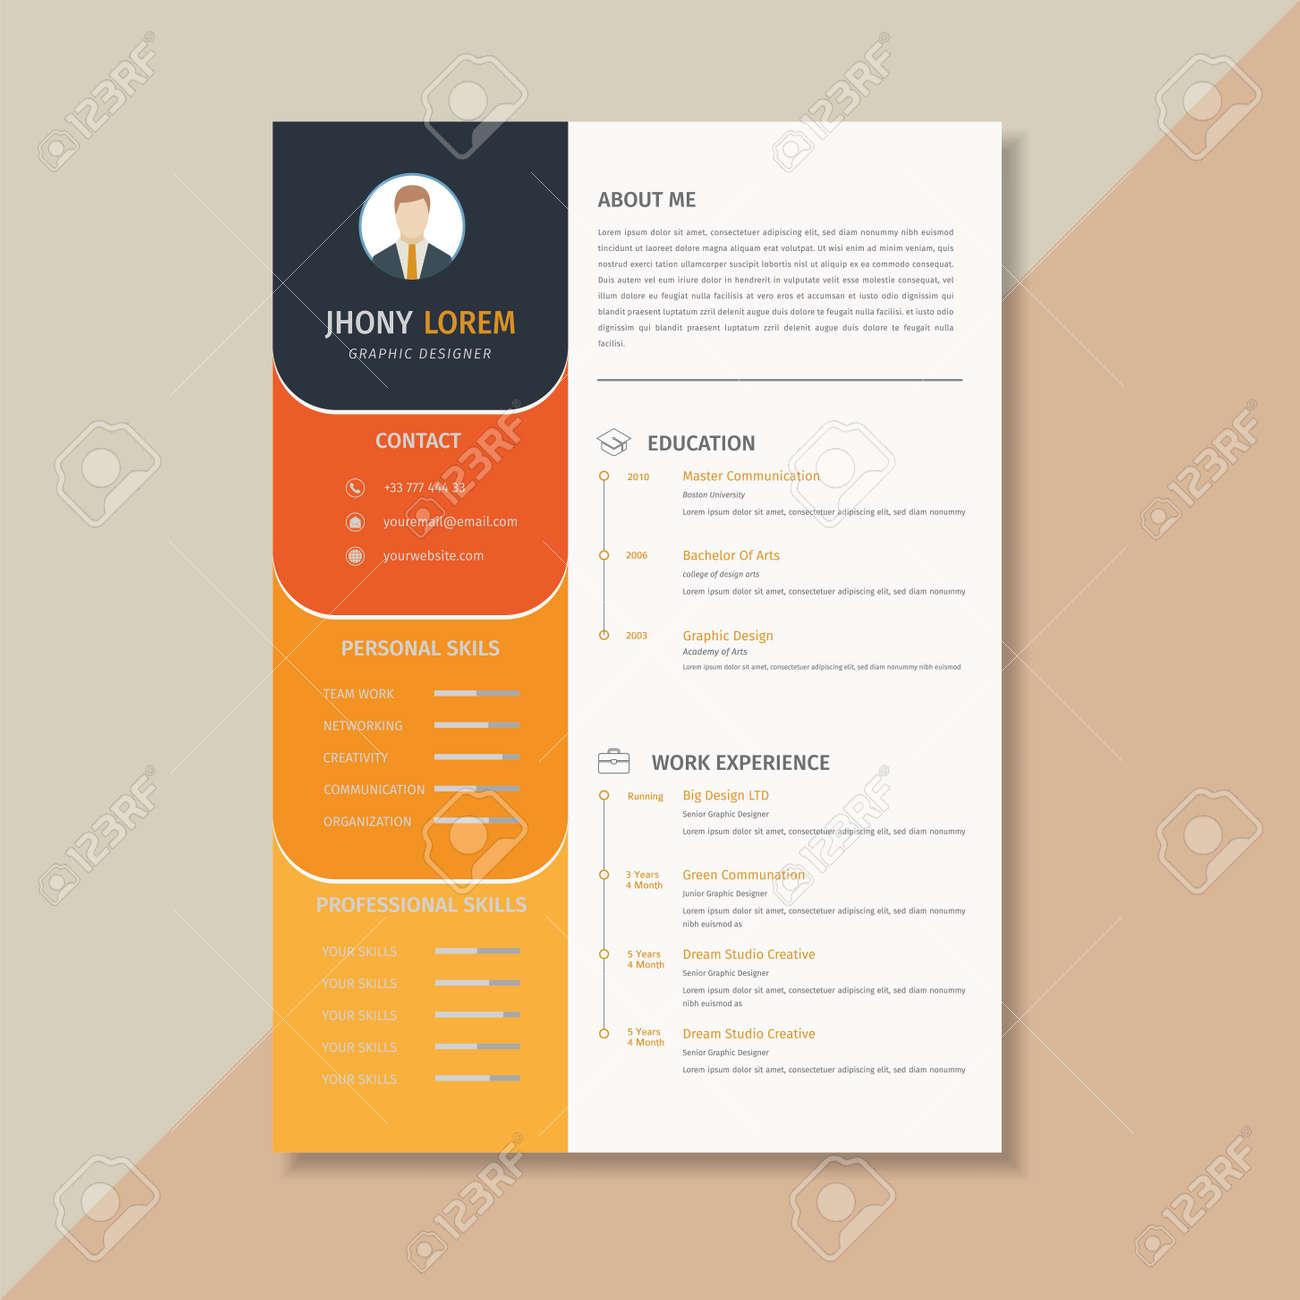 Creative Resume Template Cv Orange And Yellow Combination